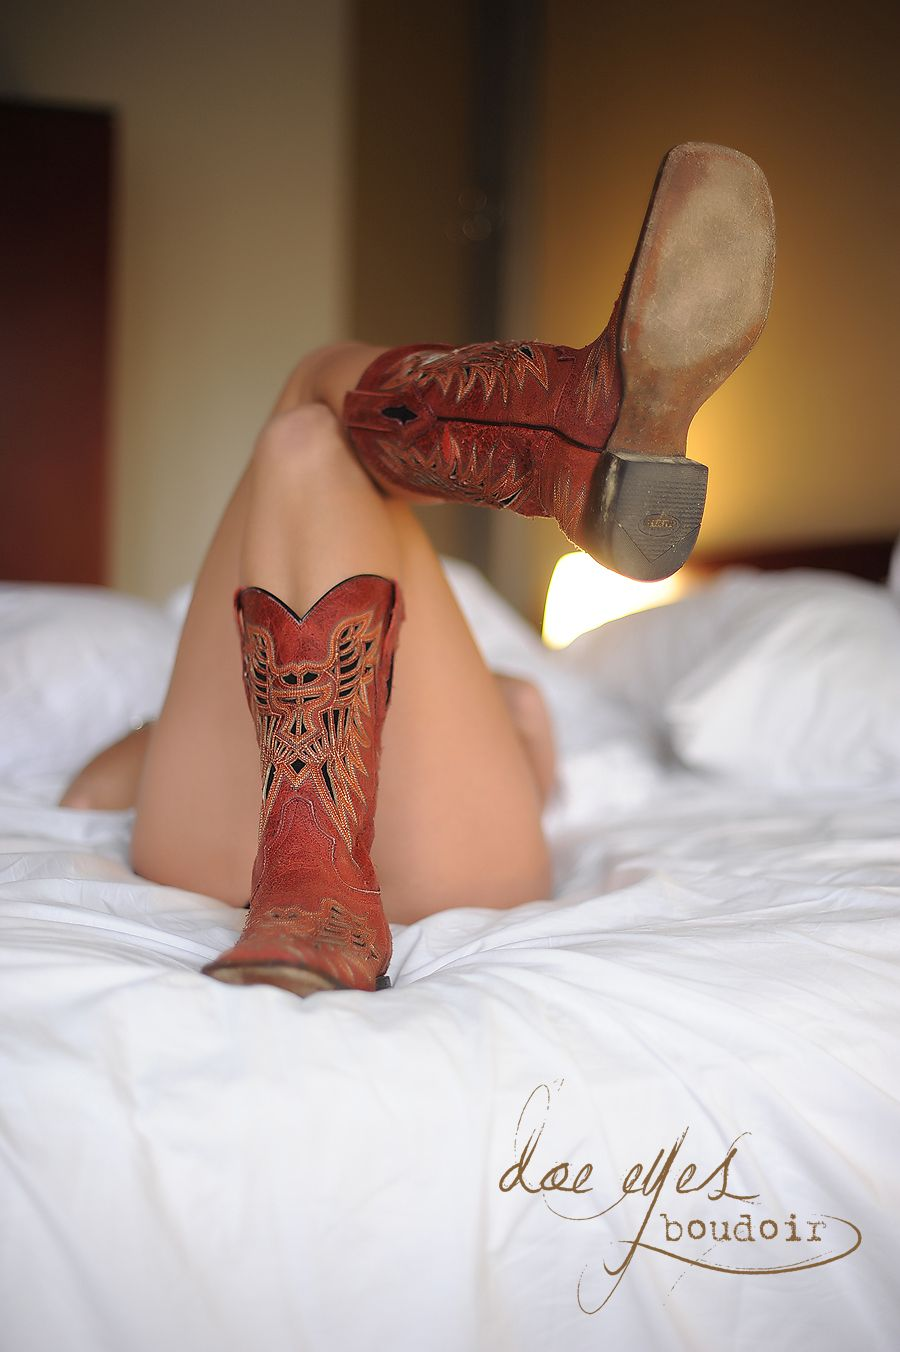 rita terry jason fennewald i love these boudoir cowboy